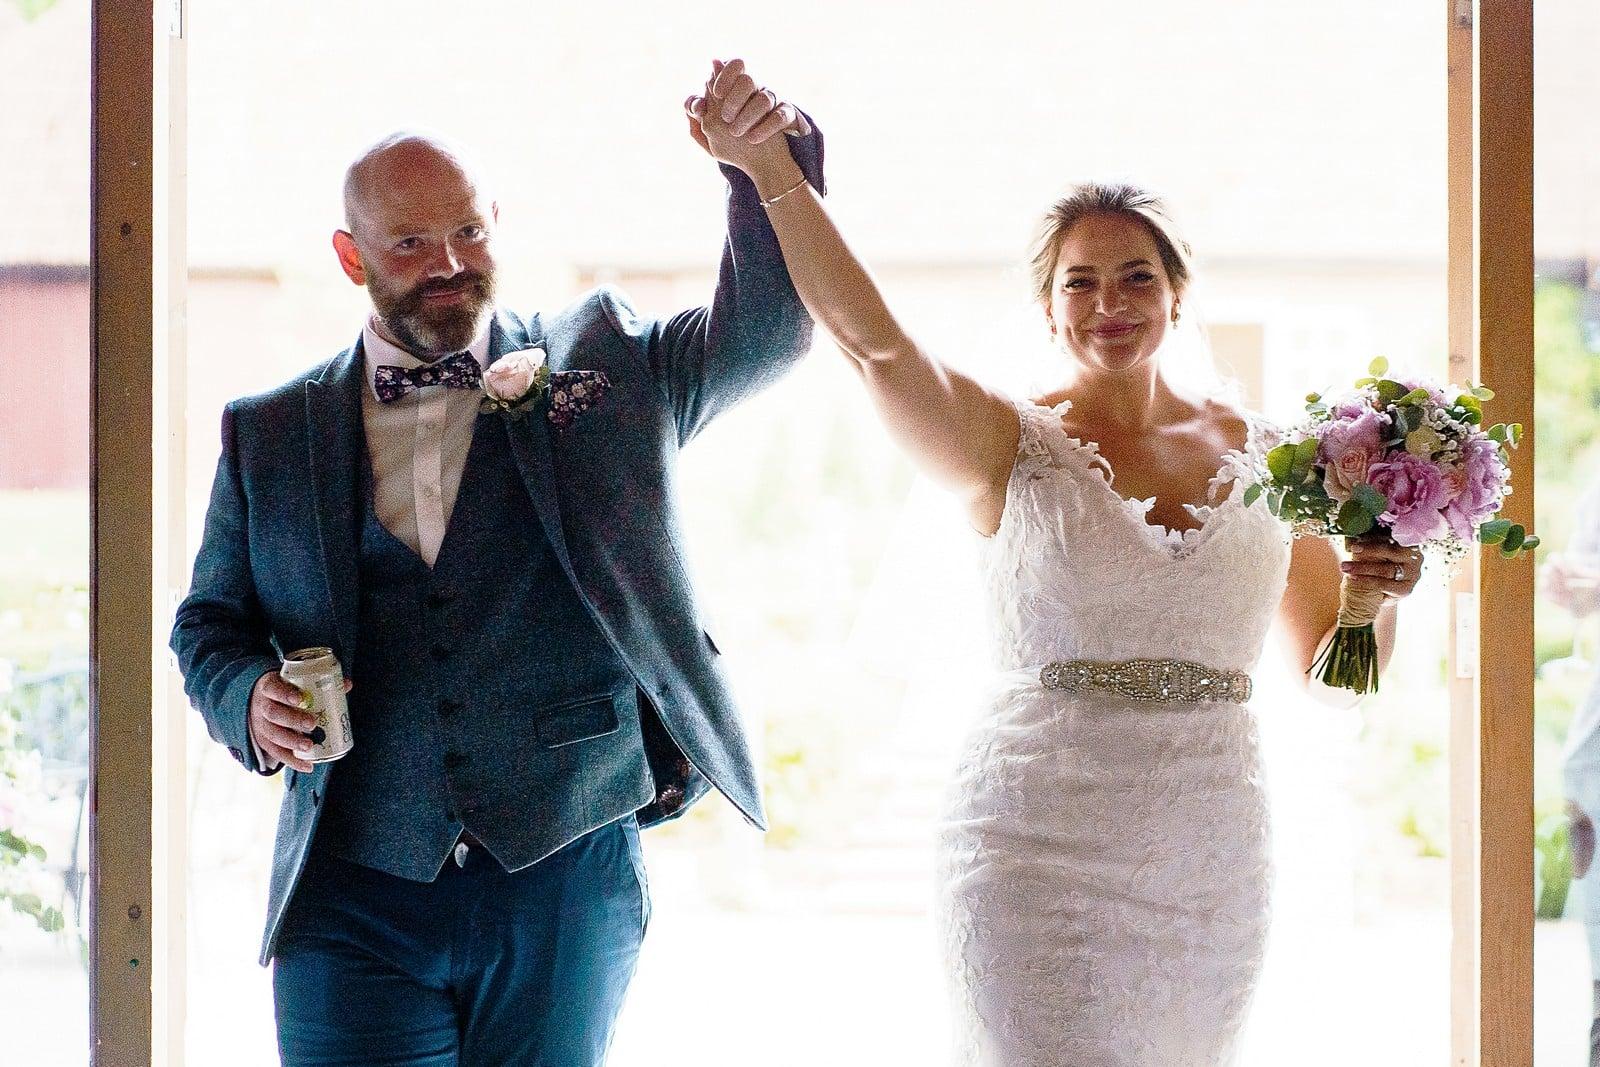 best of 2019 - Ufton barns wedding photography 021